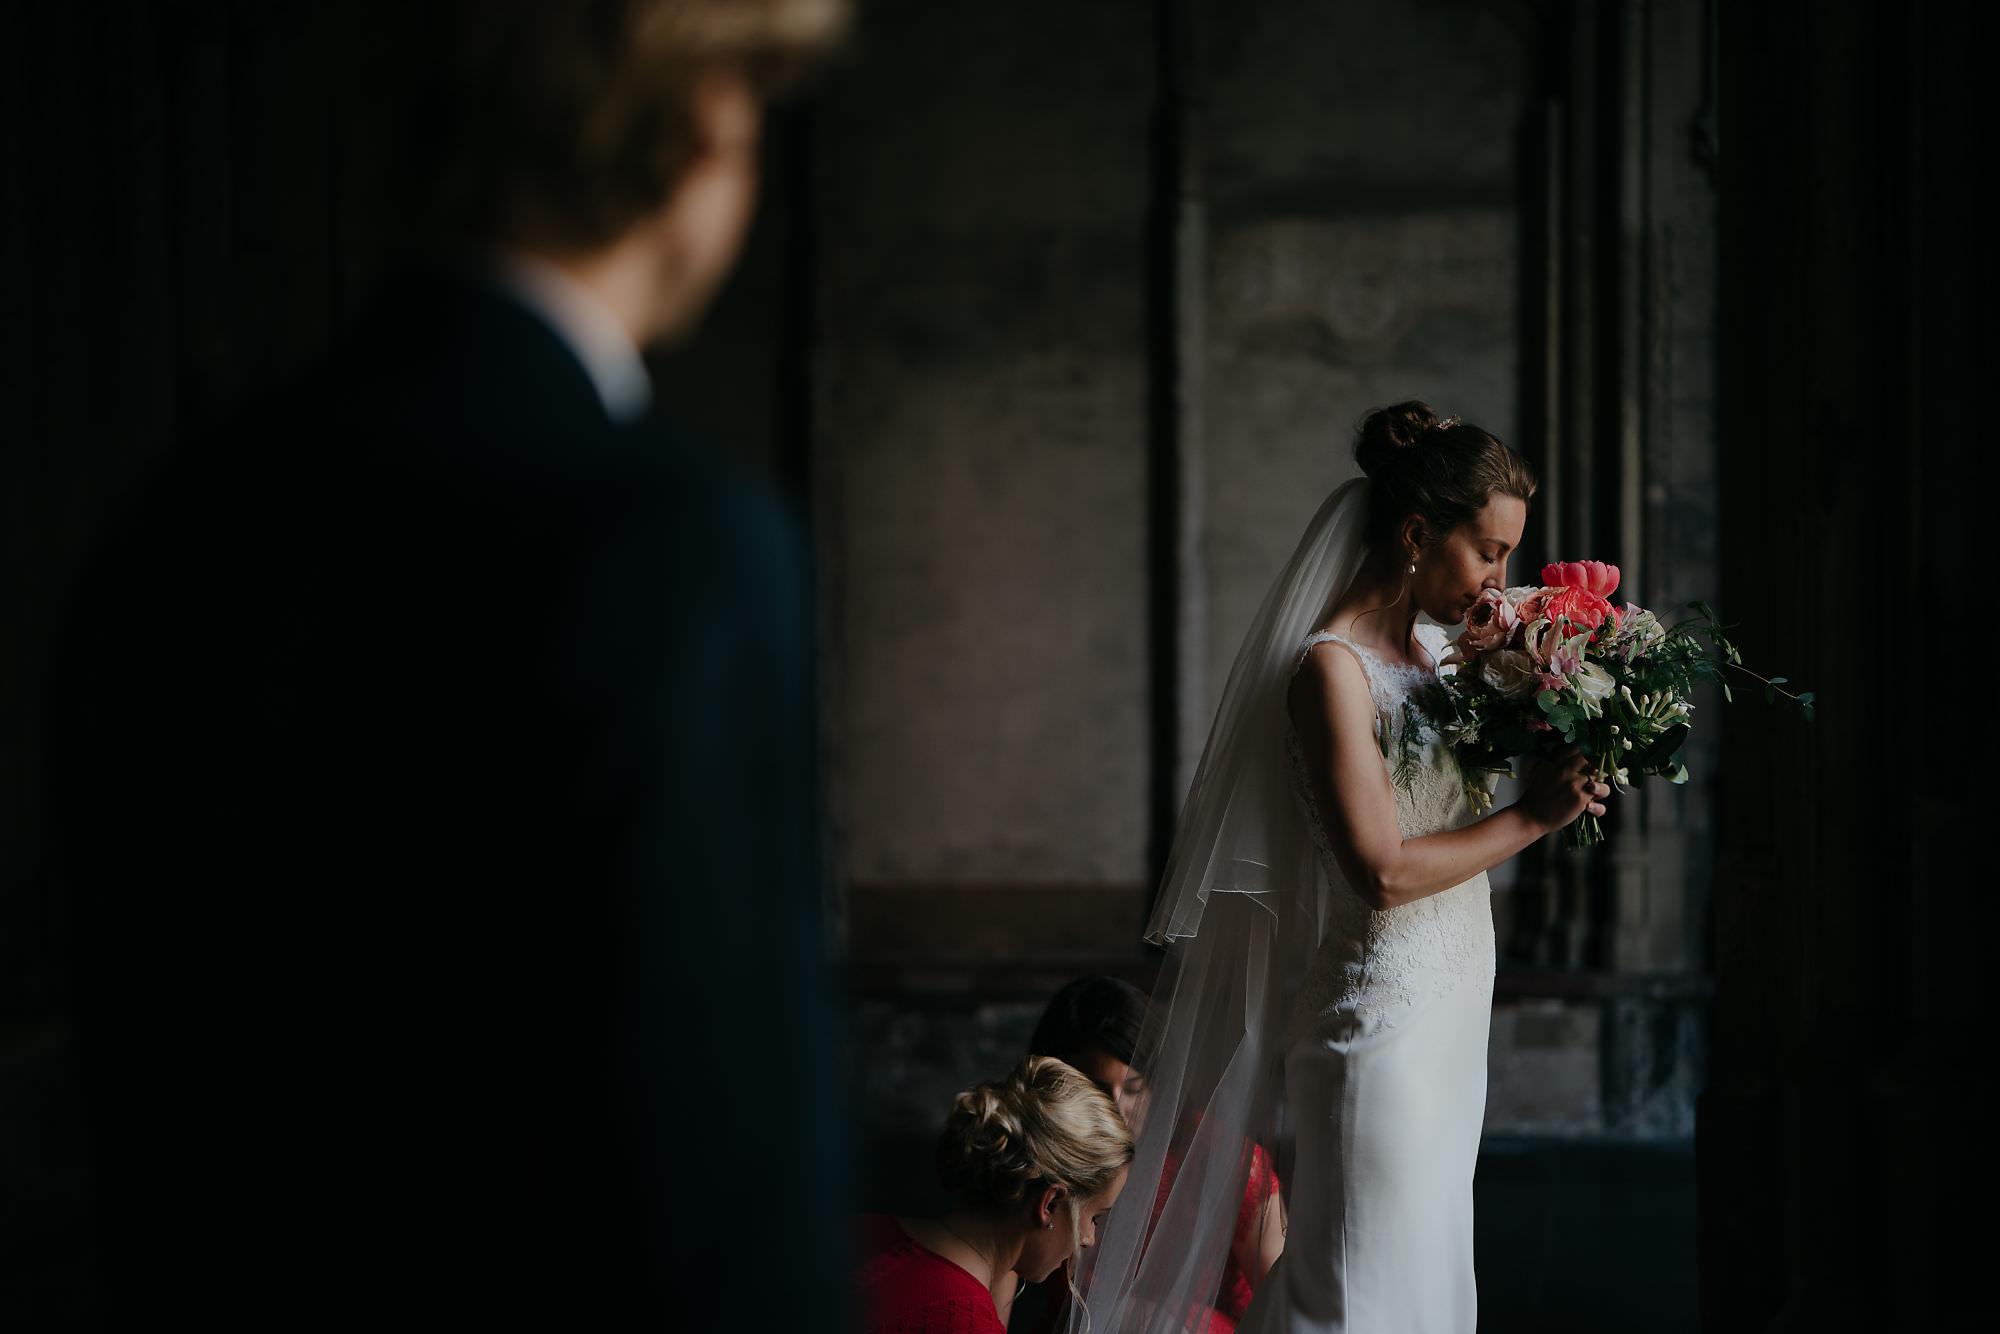 wedding photographer amsterdam couple married in domtoren utrecht